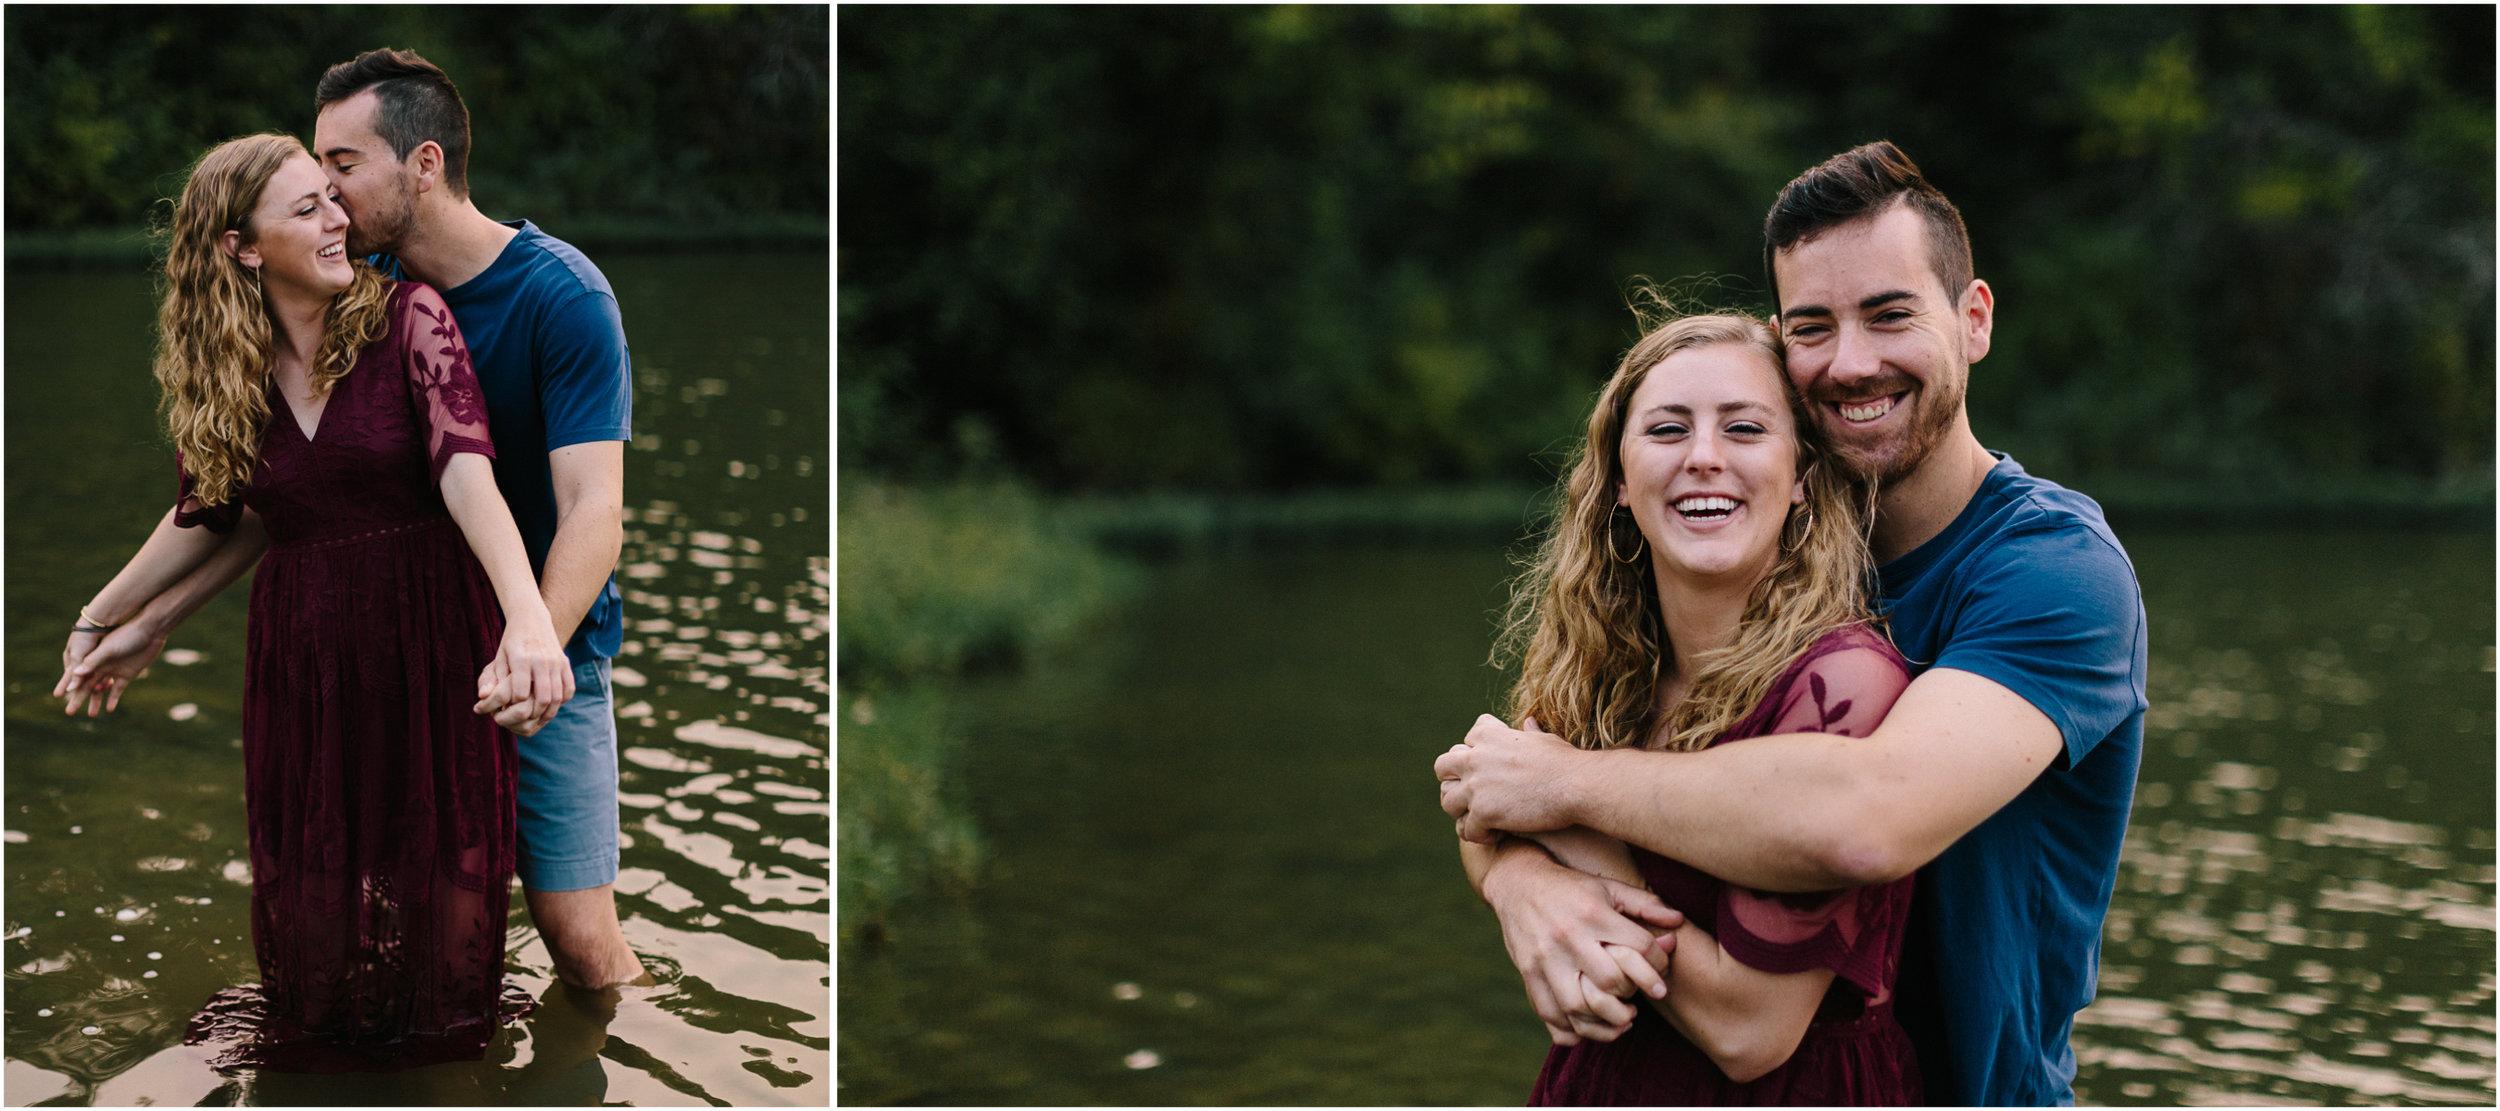 alyssa barletter photography shawnee mission lake photos-14.jpg